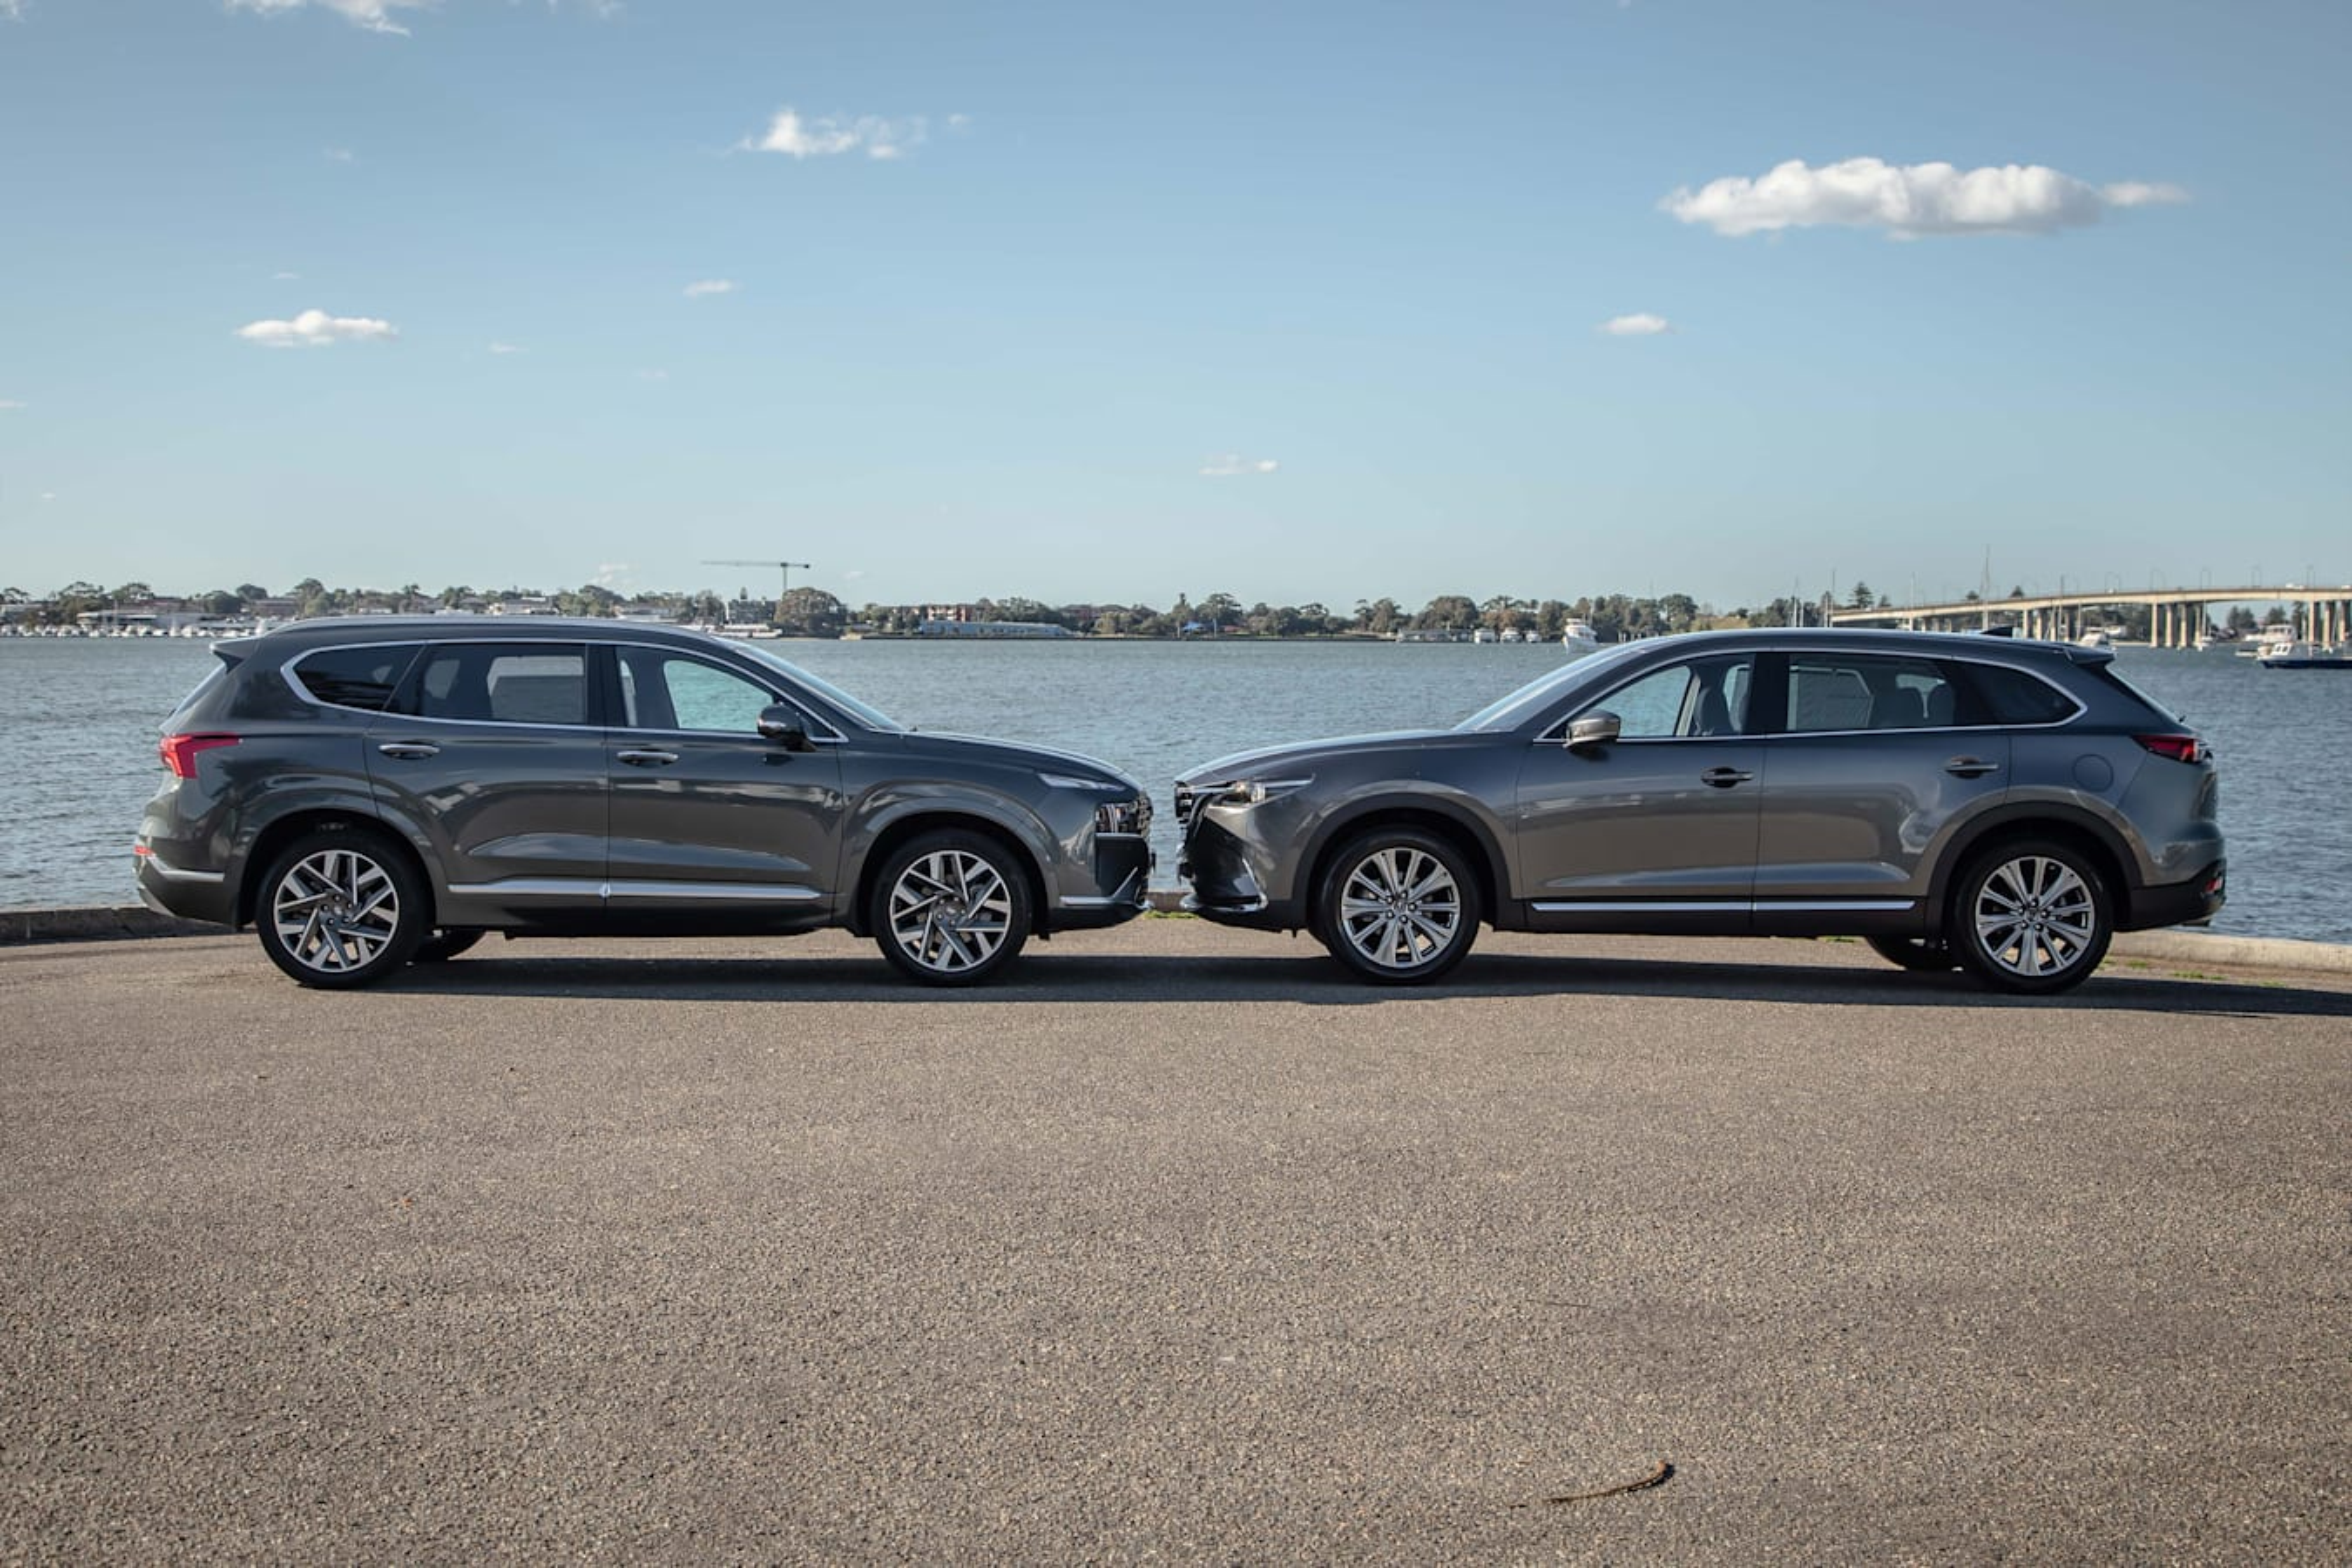 Which Car Car Reviews 2021 Hyundai Santa Fe Highlander Diesel Vs Mazda CX 9 Azami AWD Comparison Side Profile